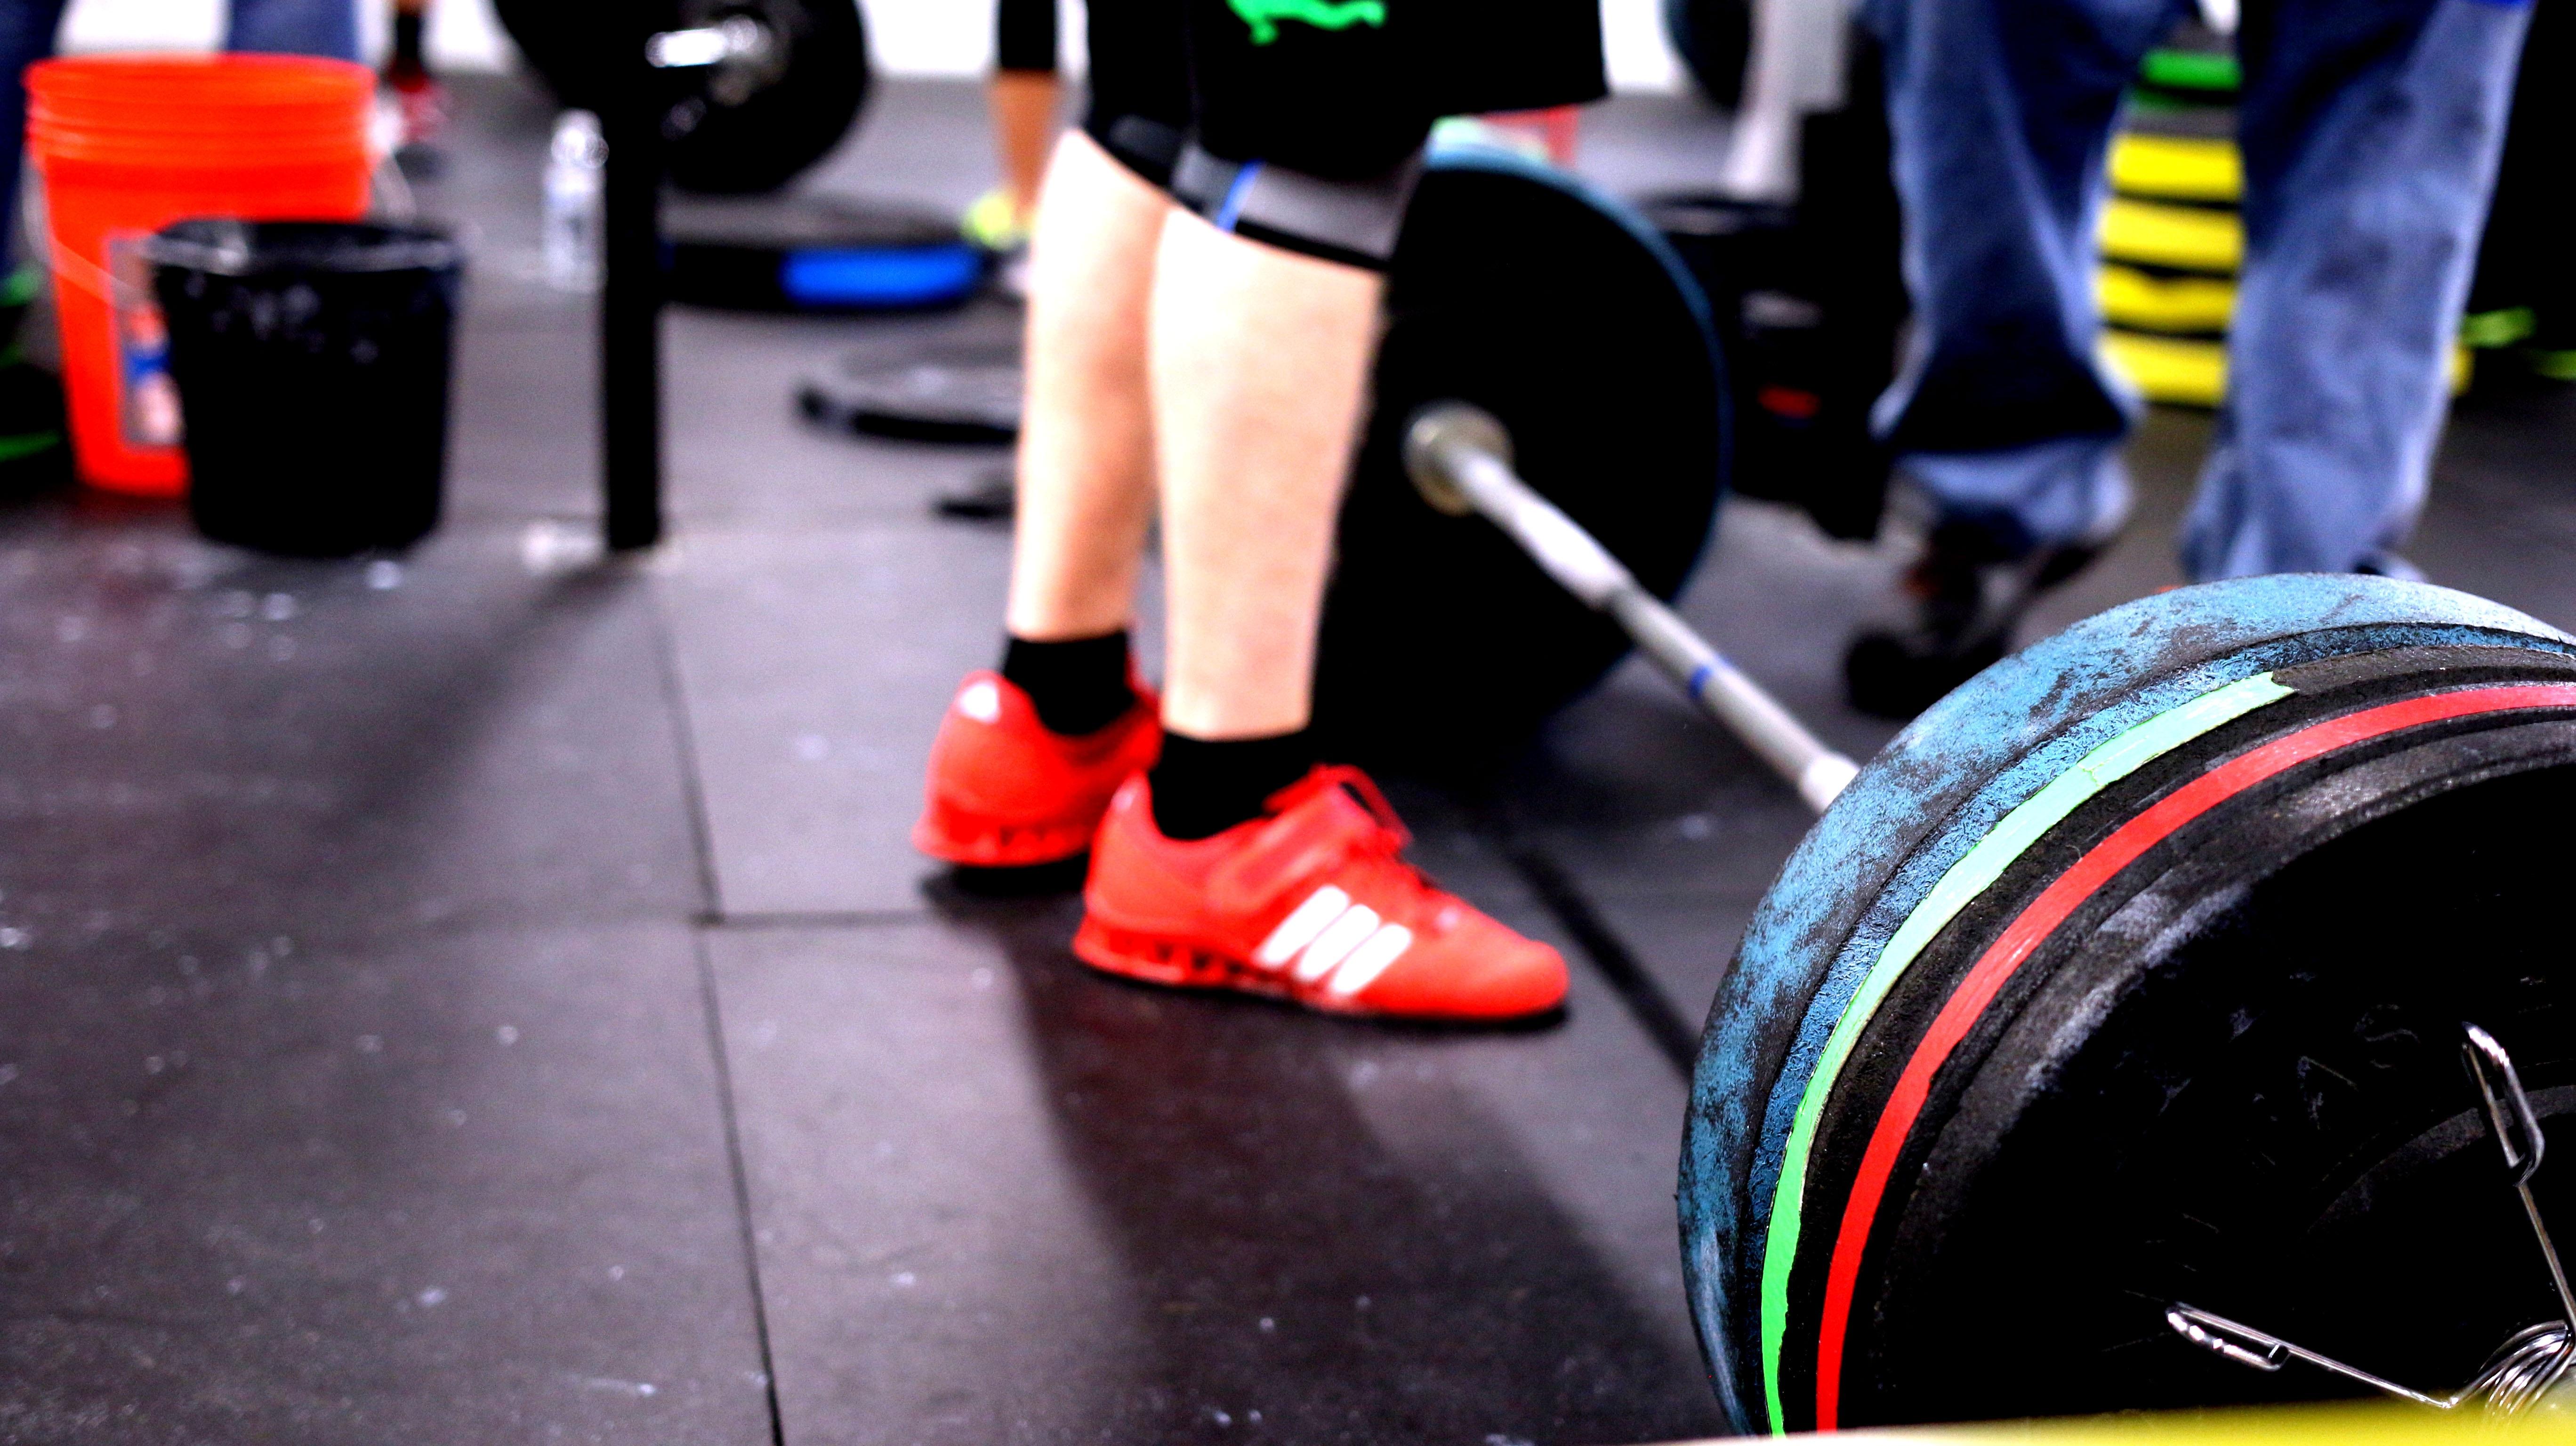 man-structure-wheel-equipment-exercise-fitness-1098934-pxhere.com